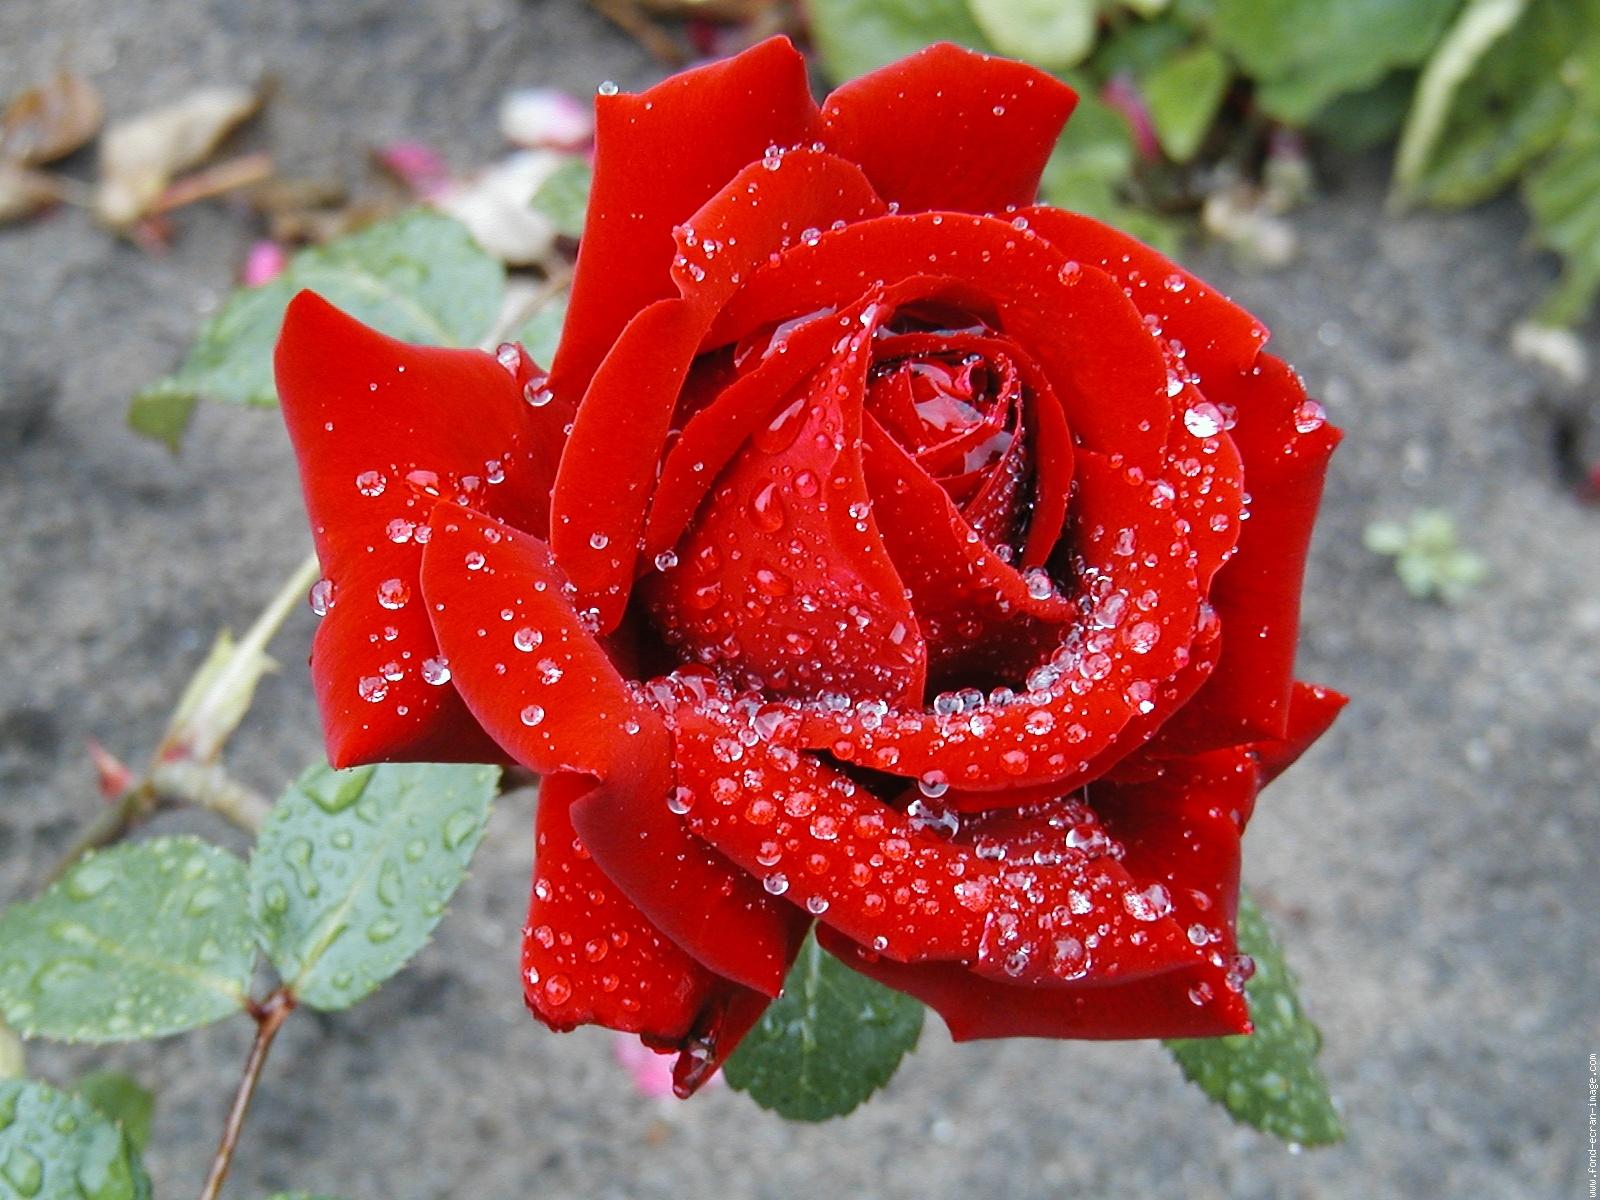 rose-ingrid-bergman-apres-la-pluie49